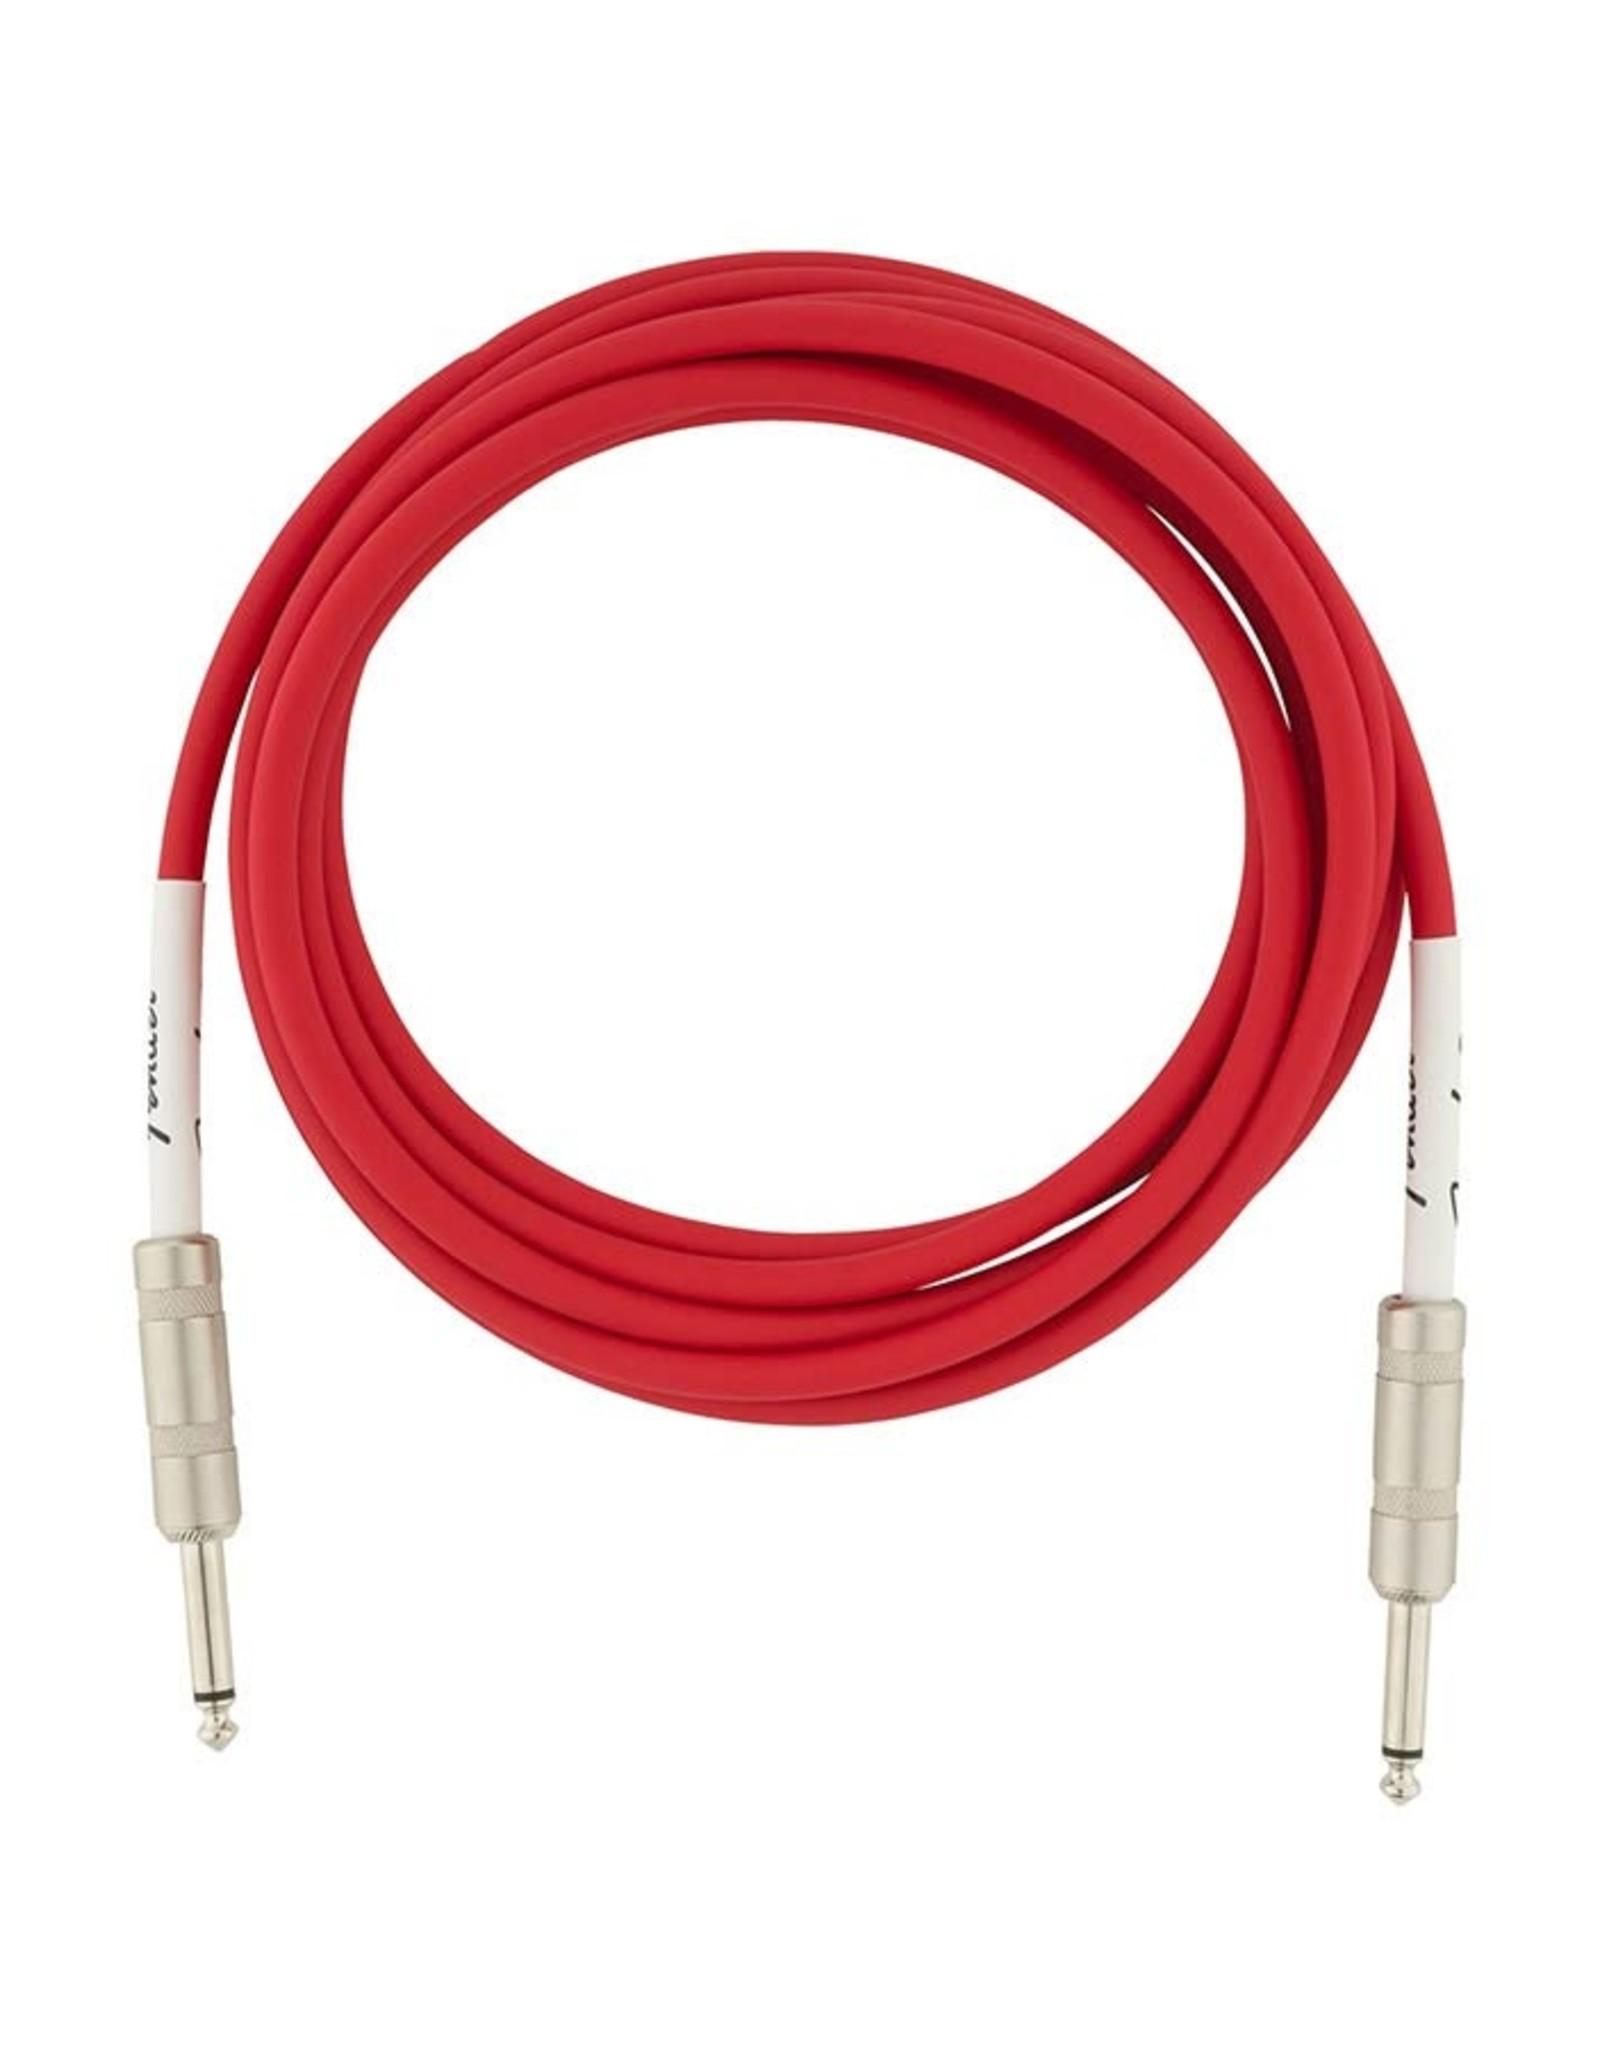 Fender Fender Original series instrument Cable 10ft fiesta red